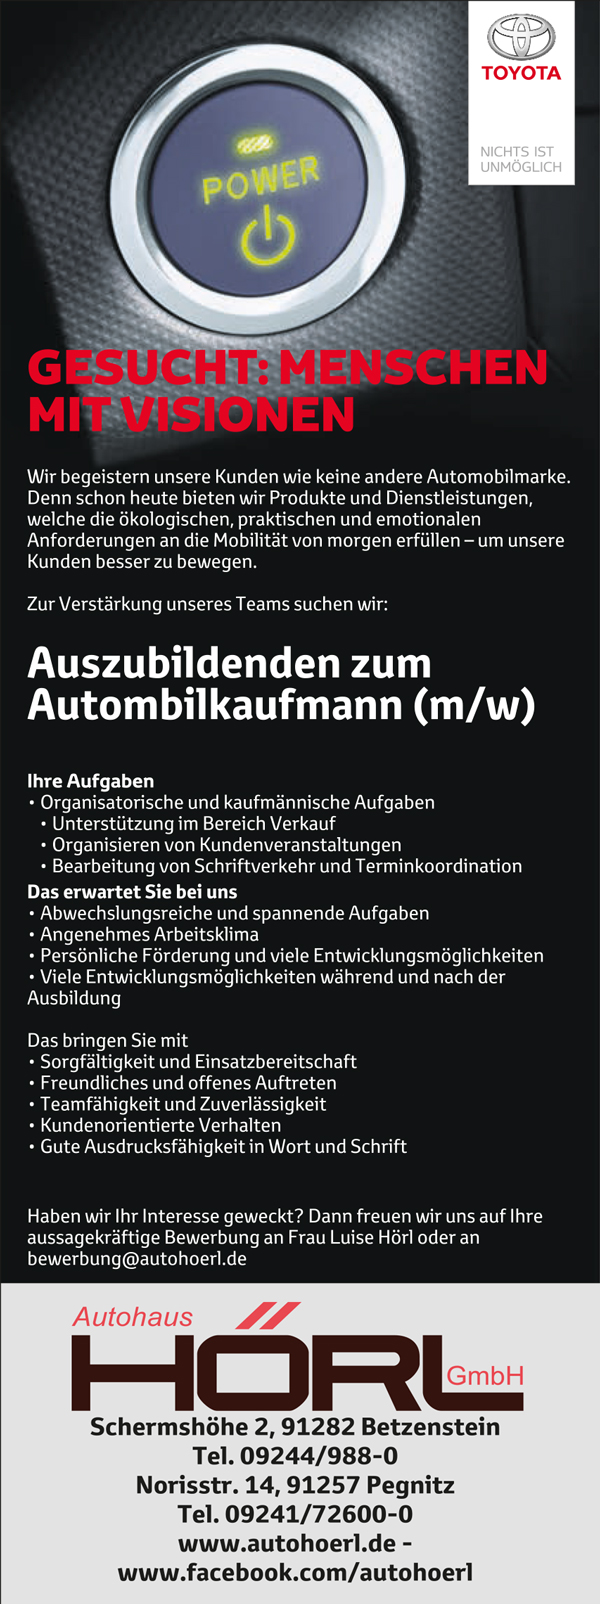 Stellenangebot Automobilkaufmann/frau